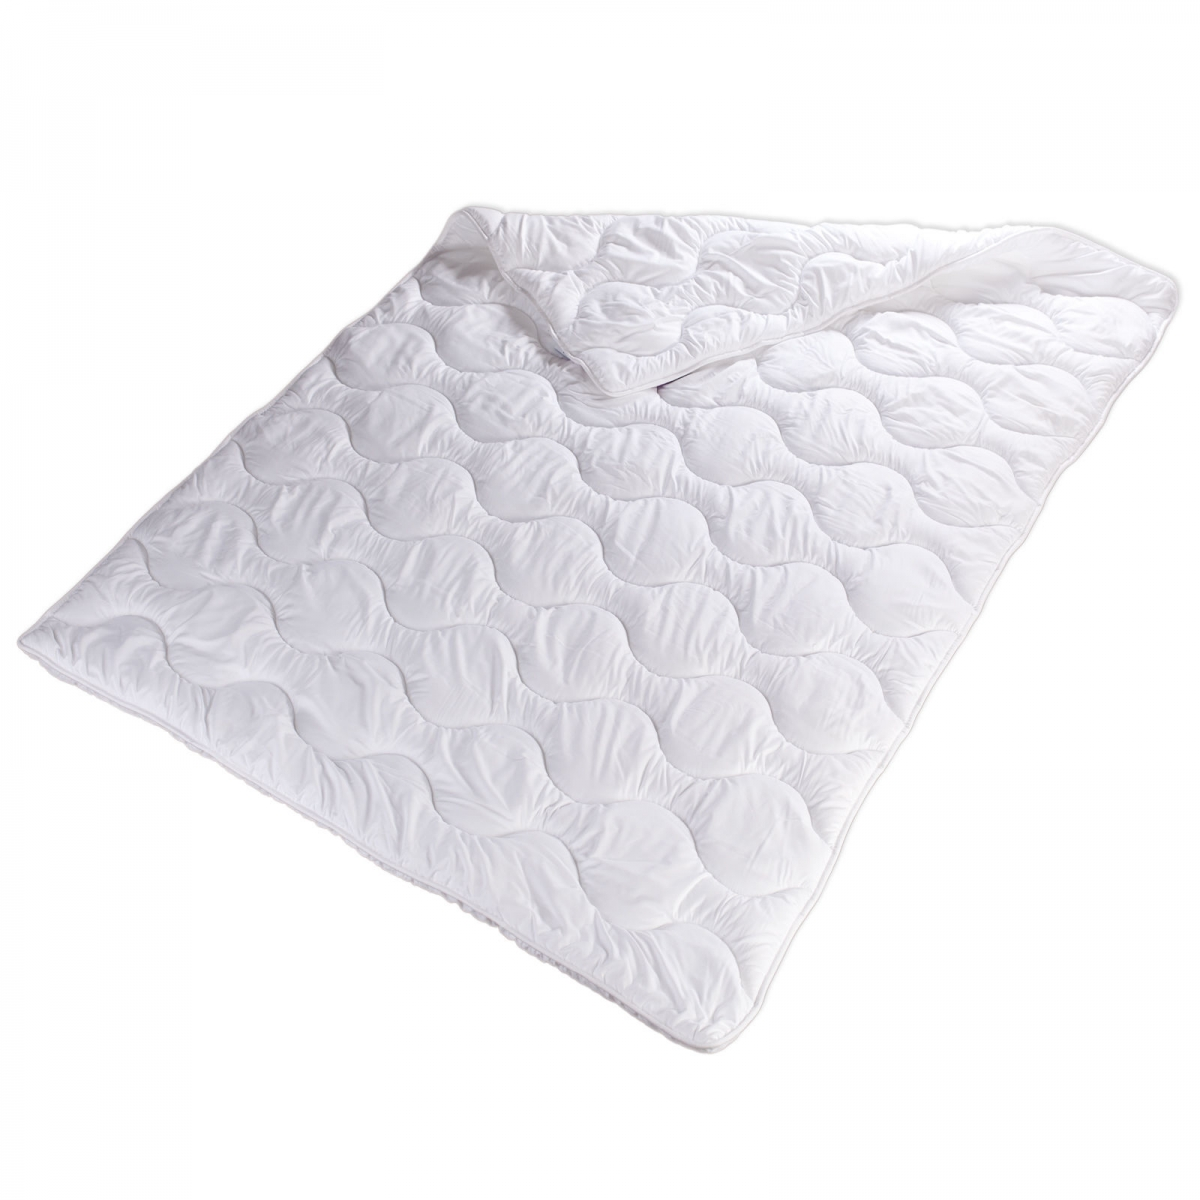 microfaser 1b sommer bettdecke steppbett zudecke. Black Bedroom Furniture Sets. Home Design Ideas